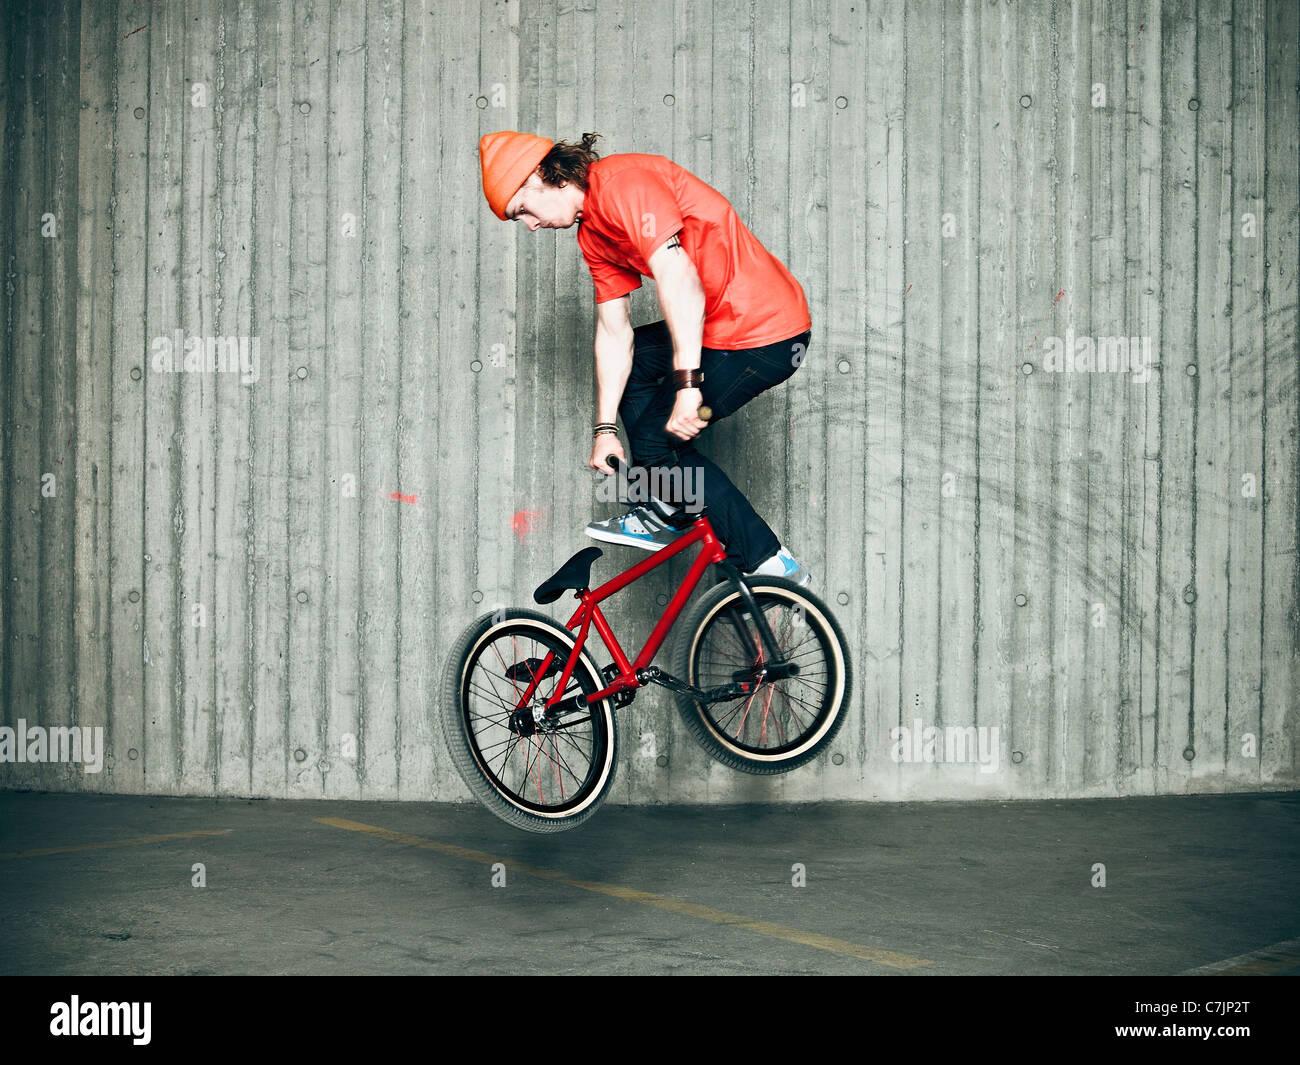 Man doing tricks on bmx bike indoors - Stock Image